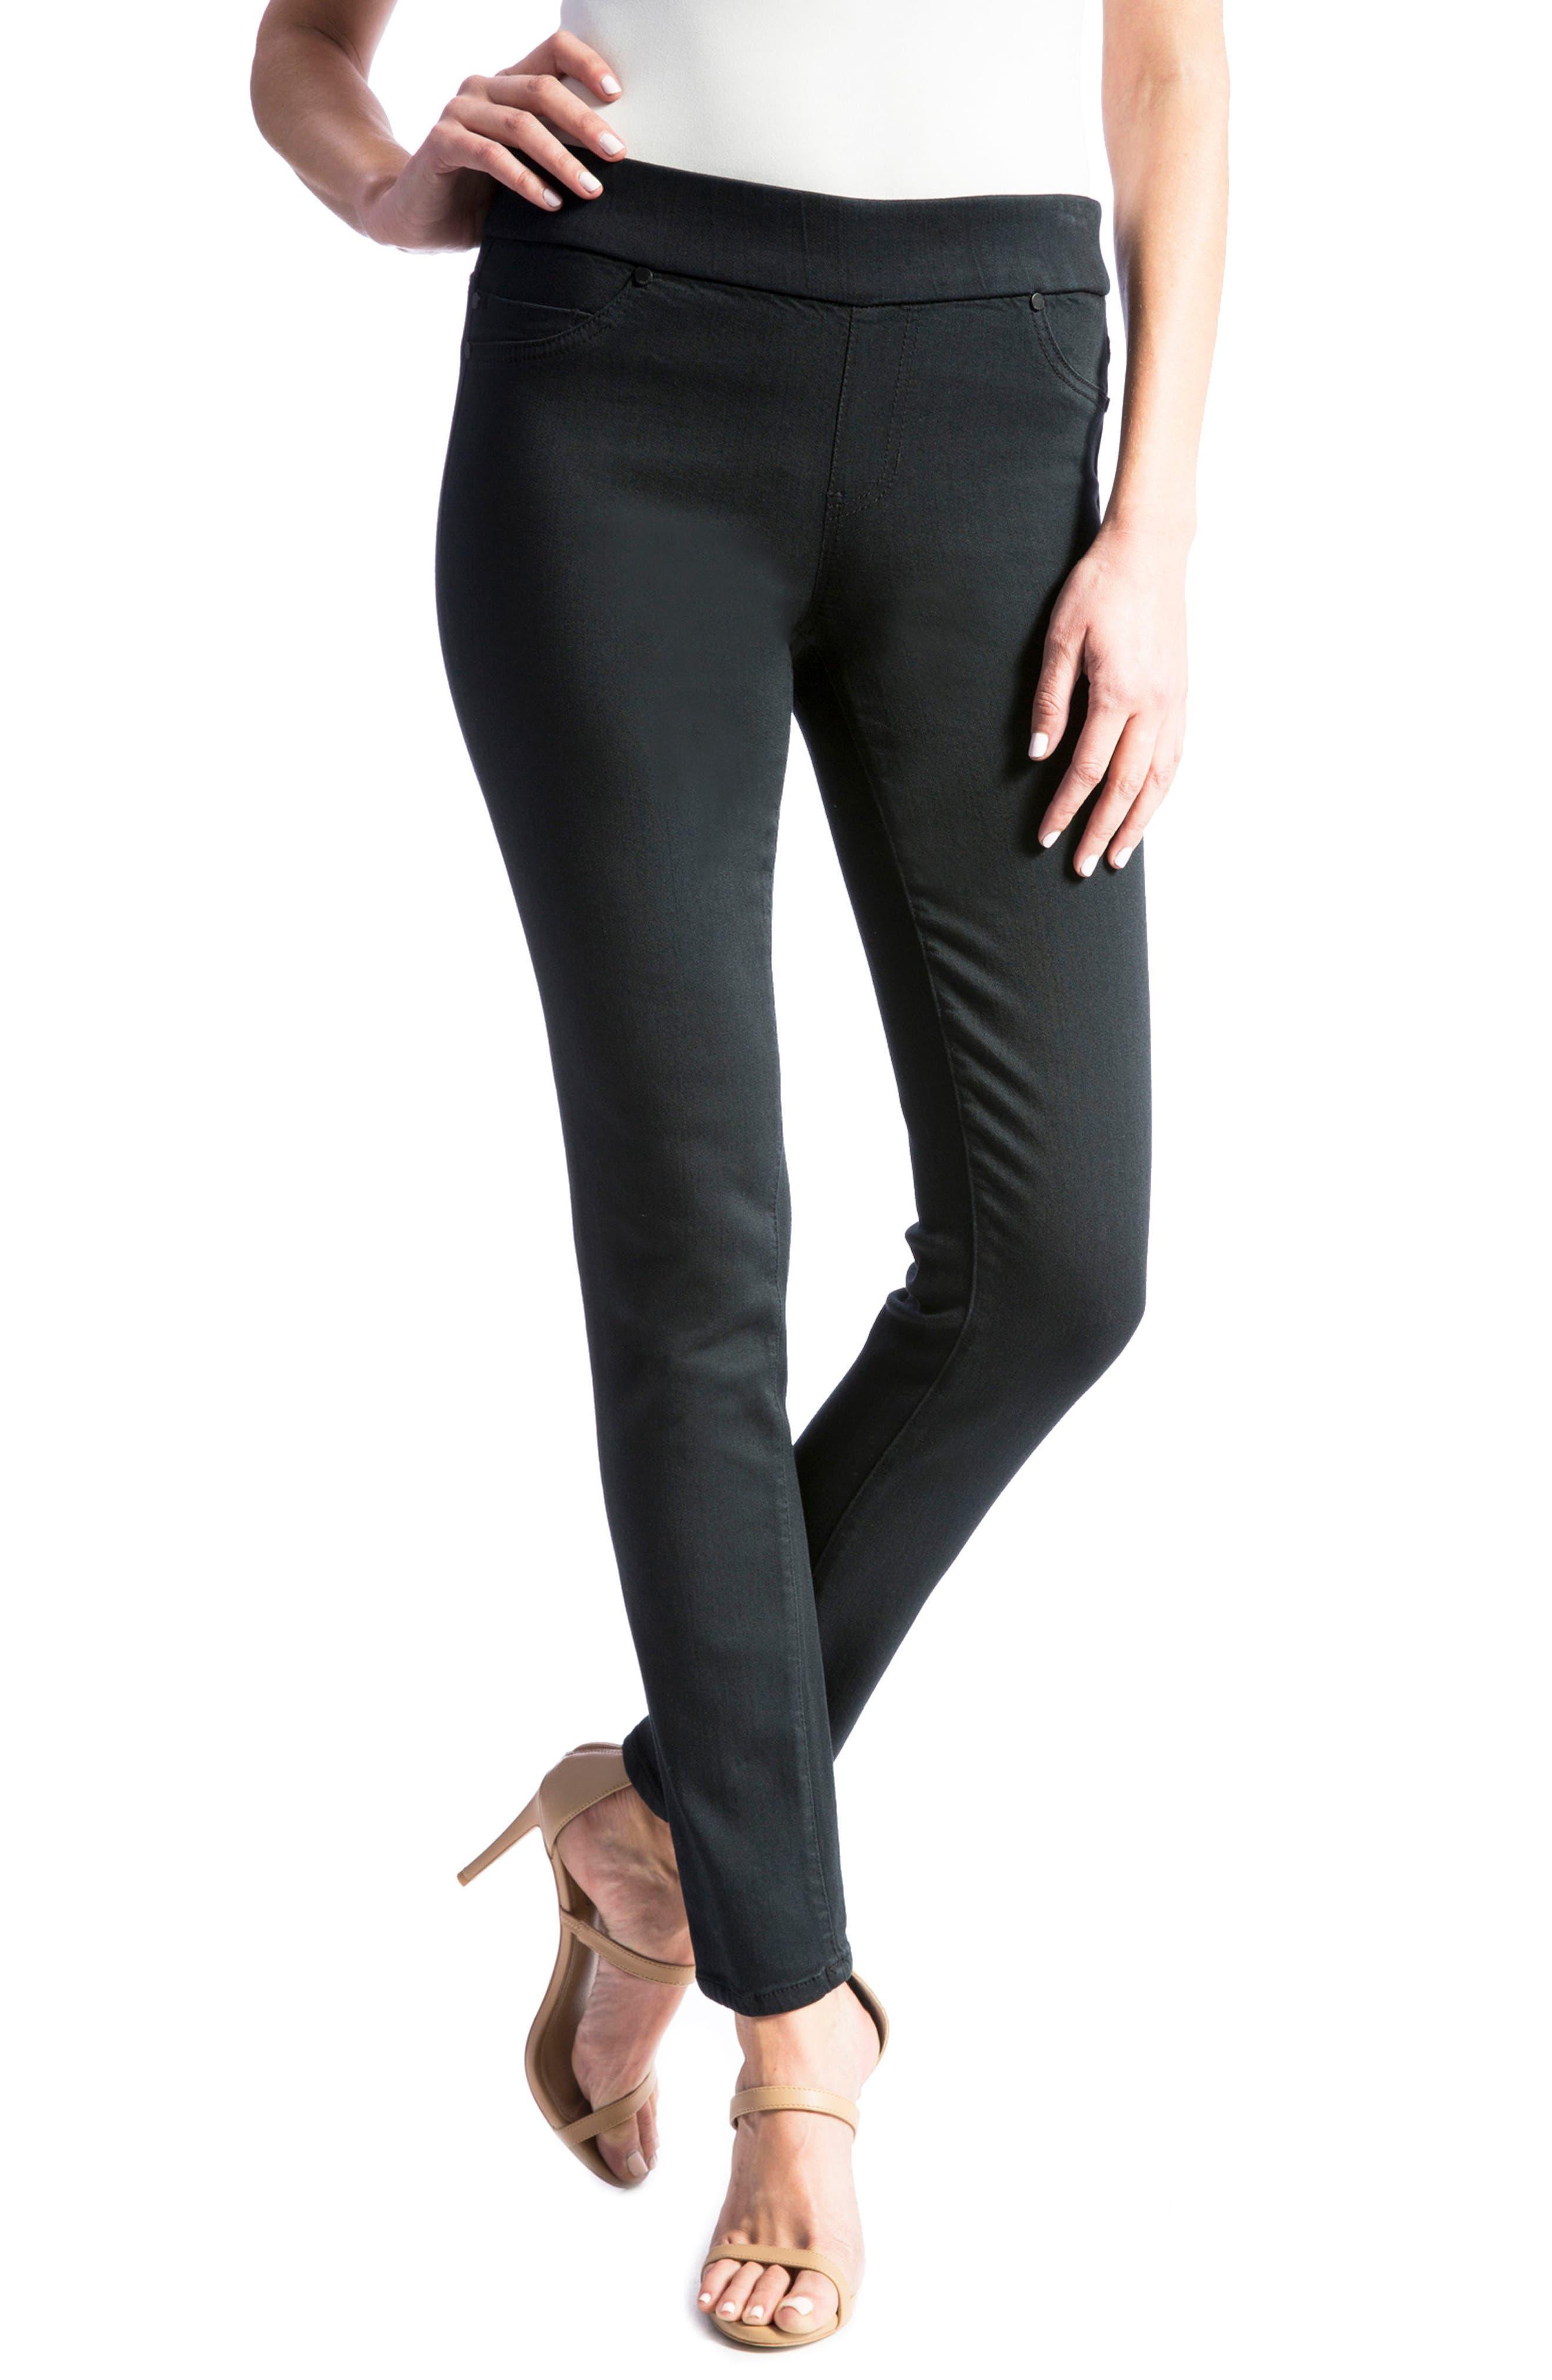 LIVERPOOL Jeans Company Sienna Mid Rise Soft Stretch Denim Leggings, Main, color, INDIGO OVERDYE BLACK